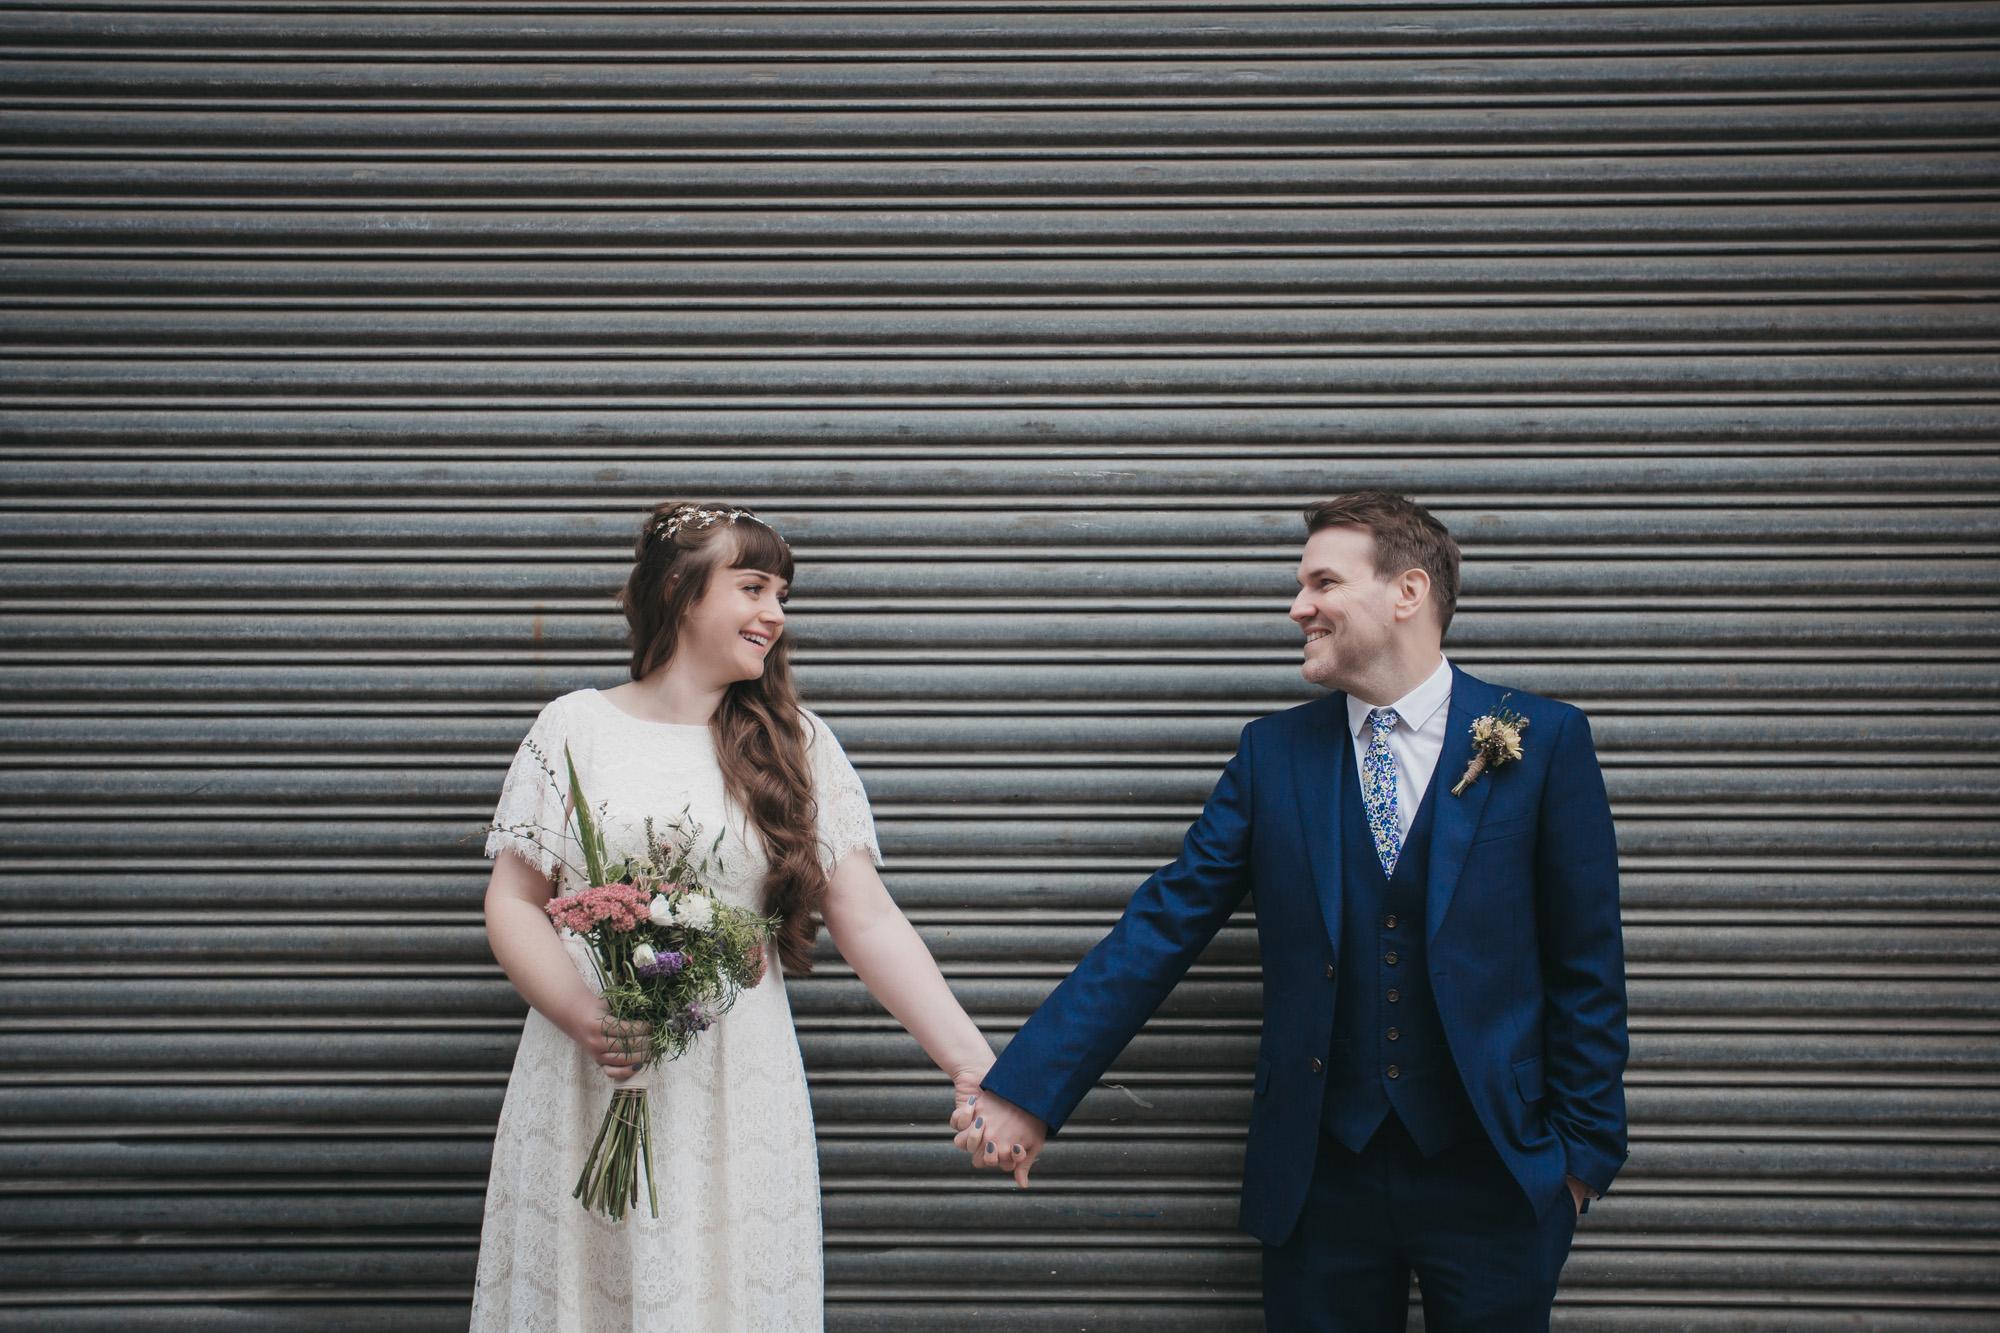 Kristy-Back-Garden-Outdoor-Wedding-Sheffield-Industrial-Warehouse-Wedding-Bohemian-Kate-Beaumont-Dahlia-Dress-37.jpg